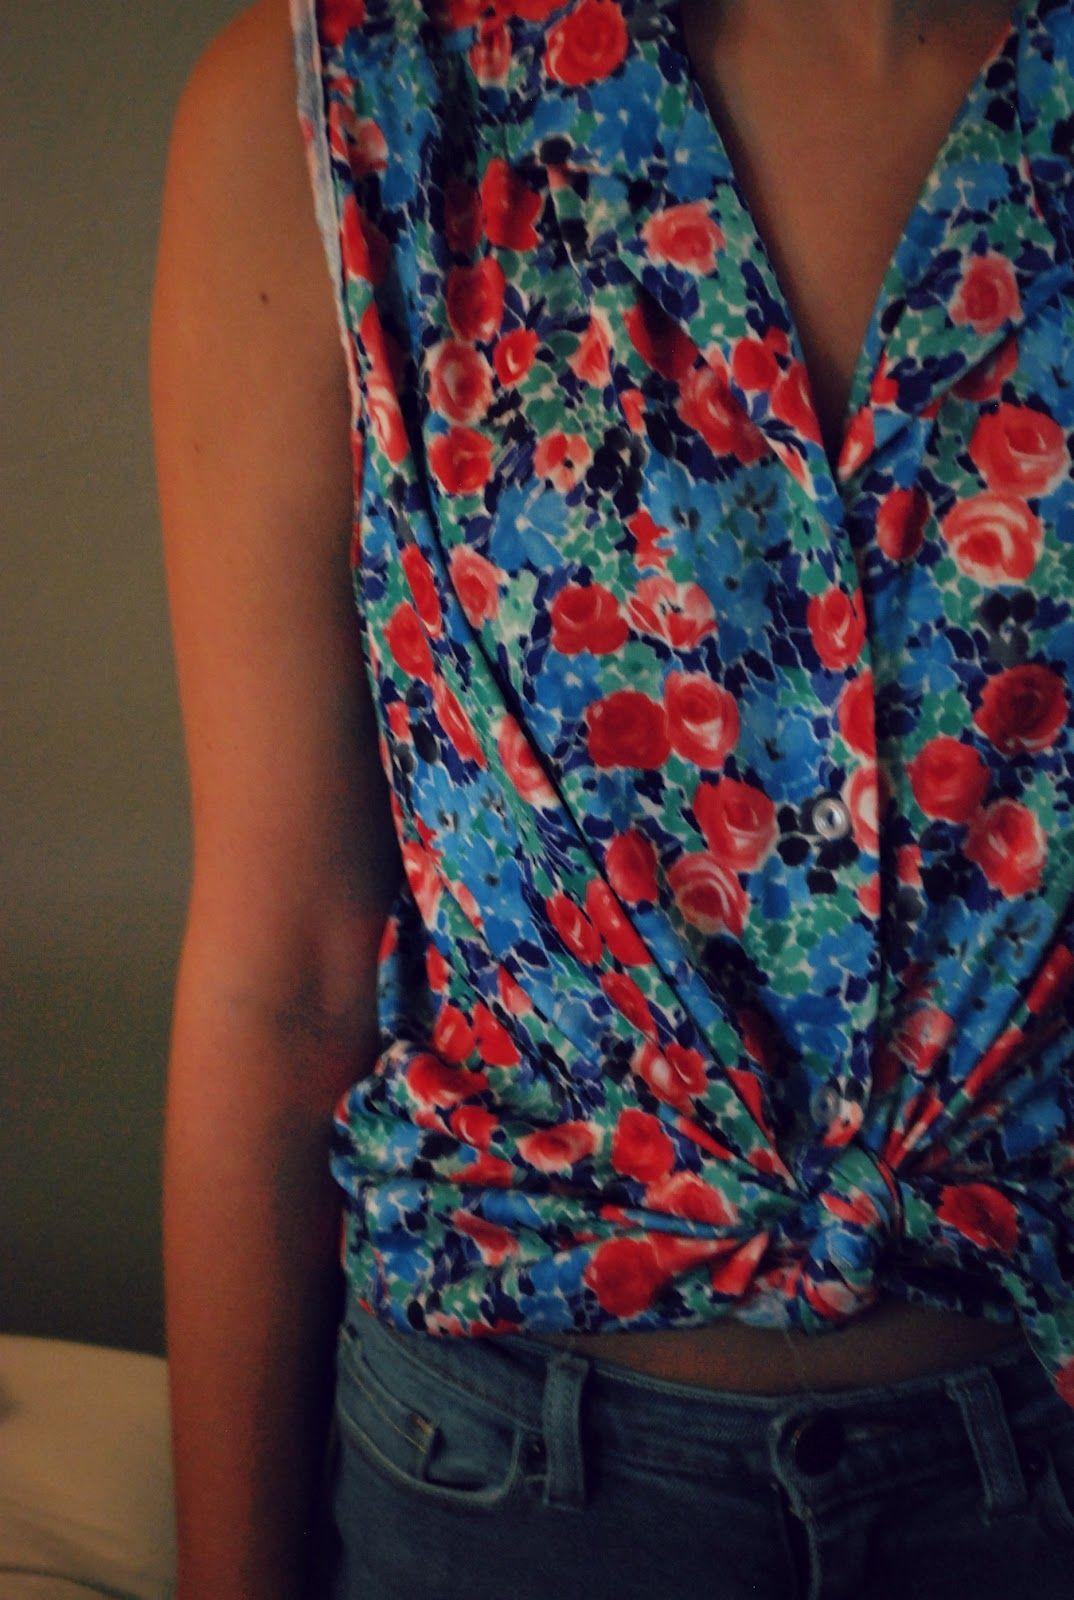 Summer-fied